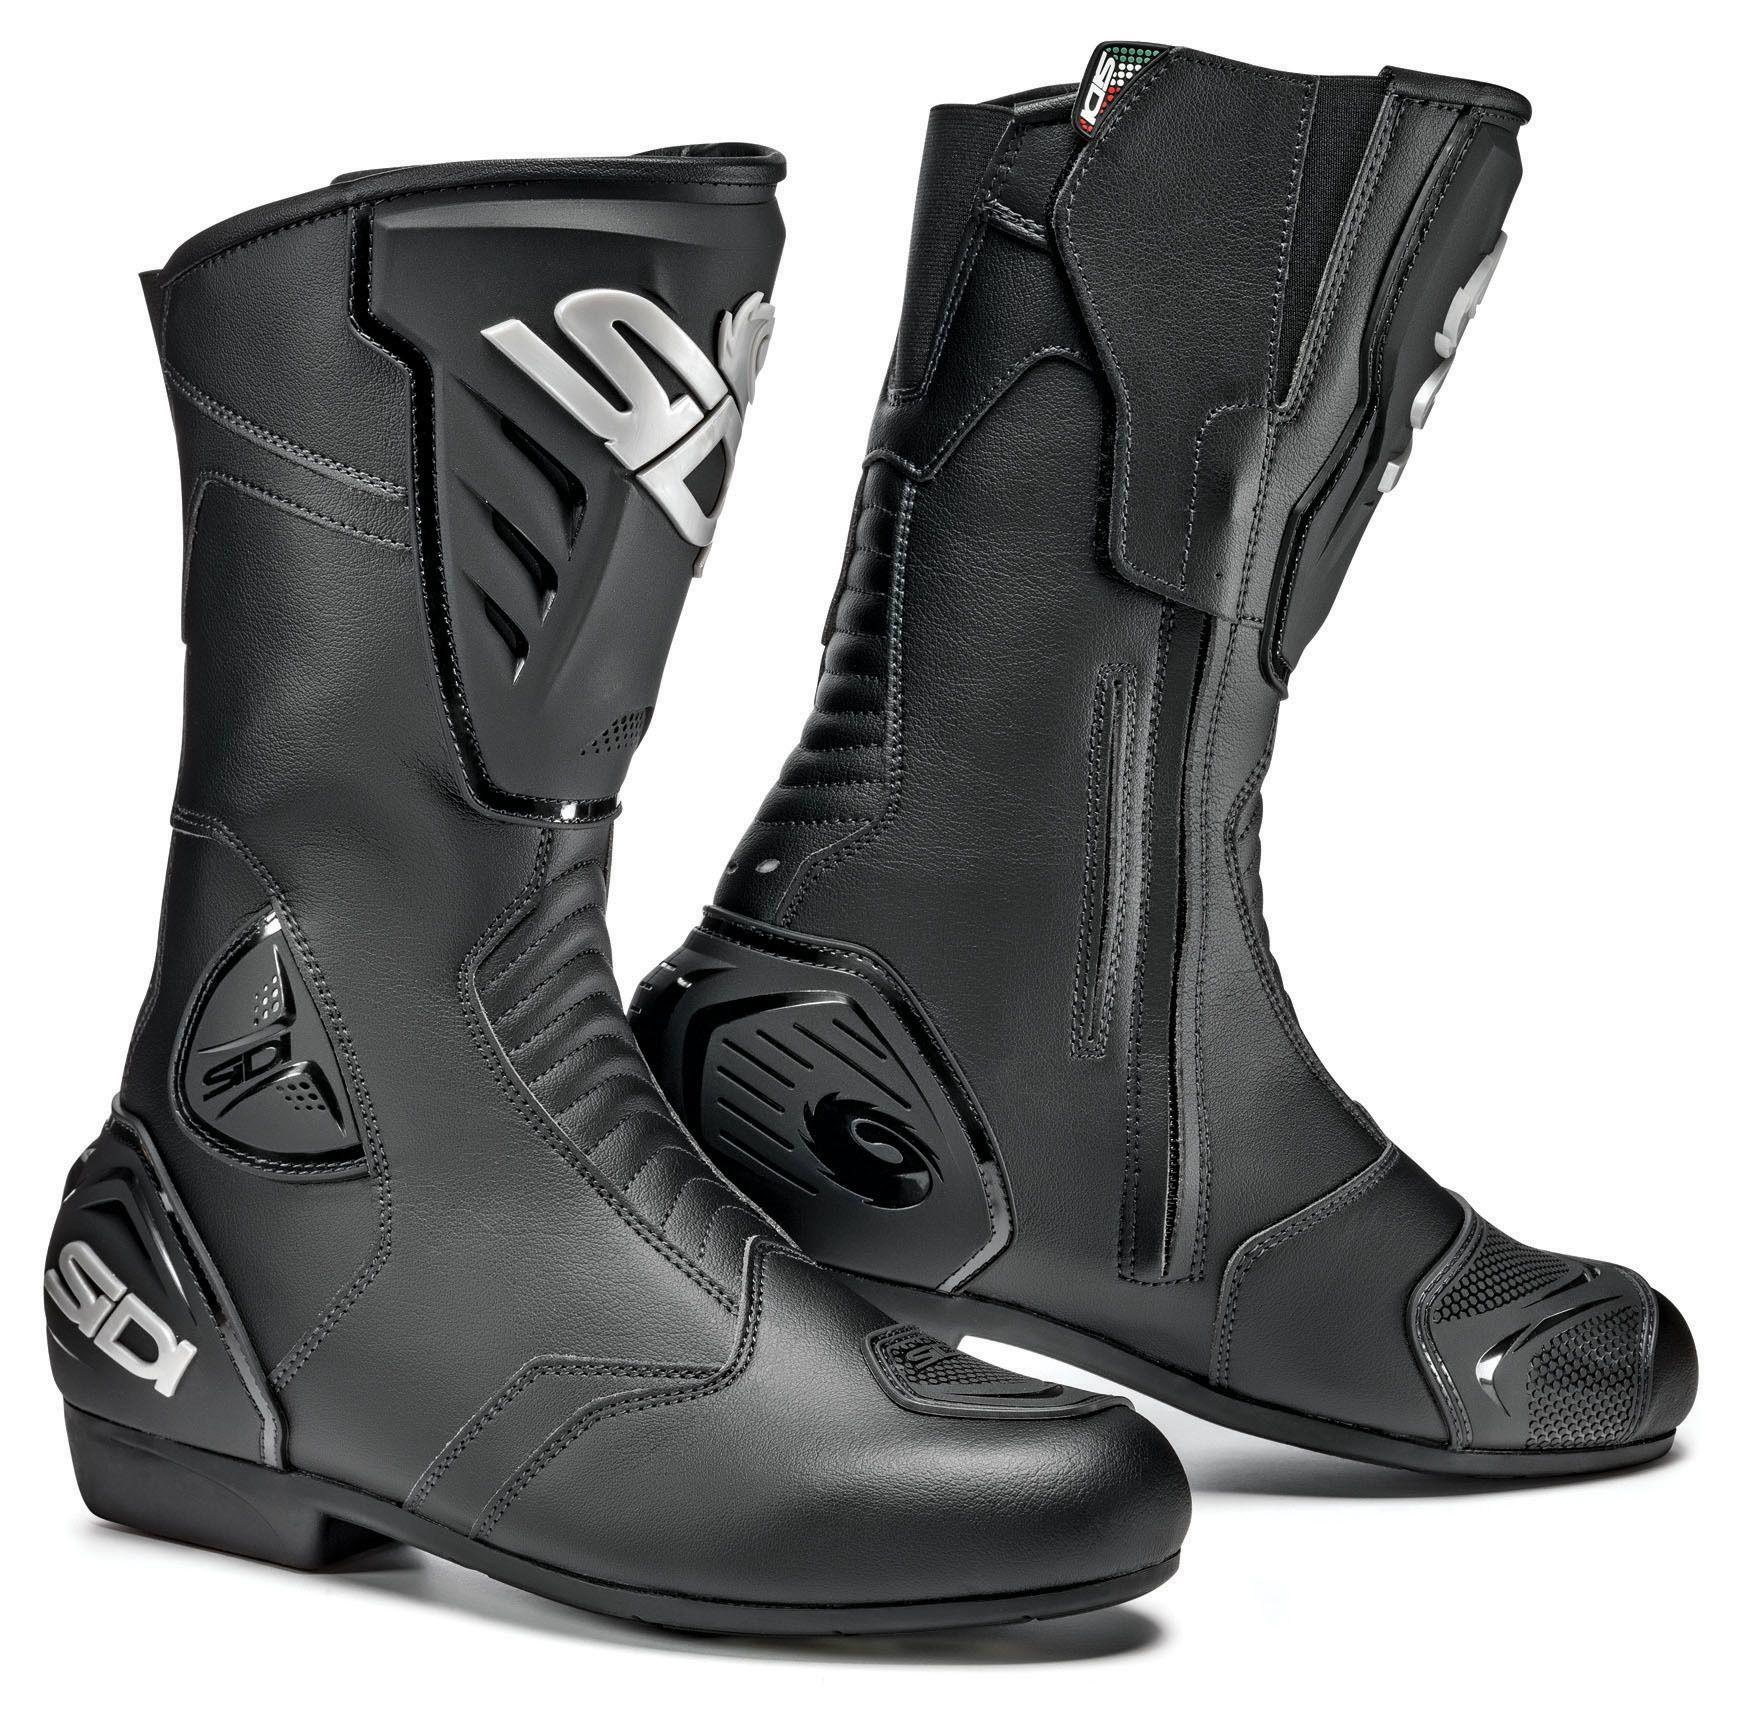 Sidi Black Rain Boots Revzilla